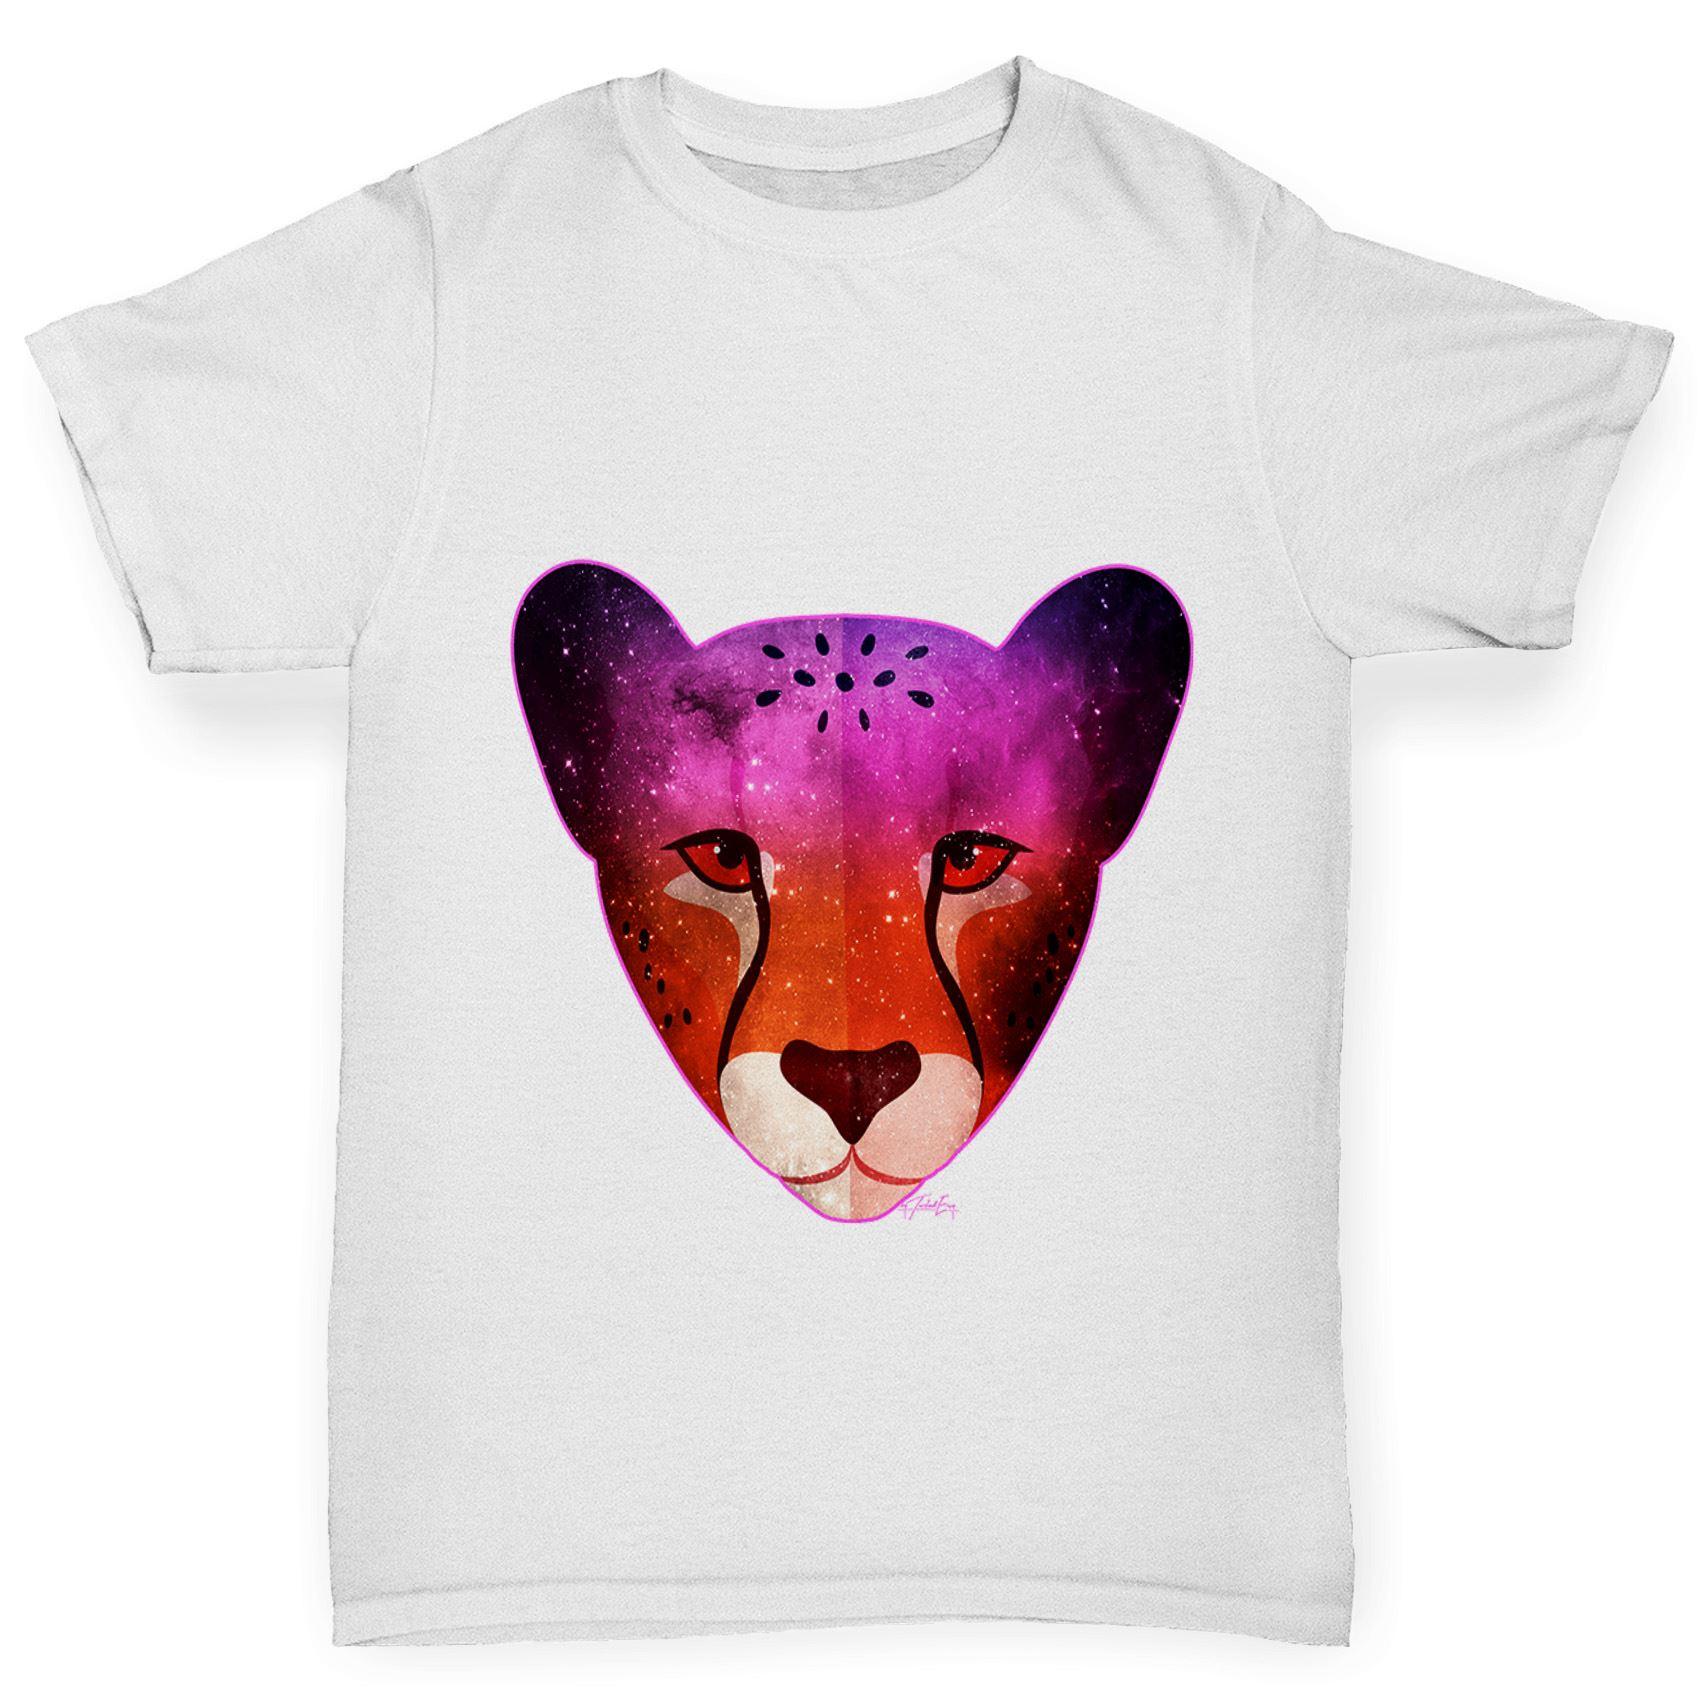 Twisted Envy Boy/'s Galaxy Zebra Head Printed Cotton T-Shirt